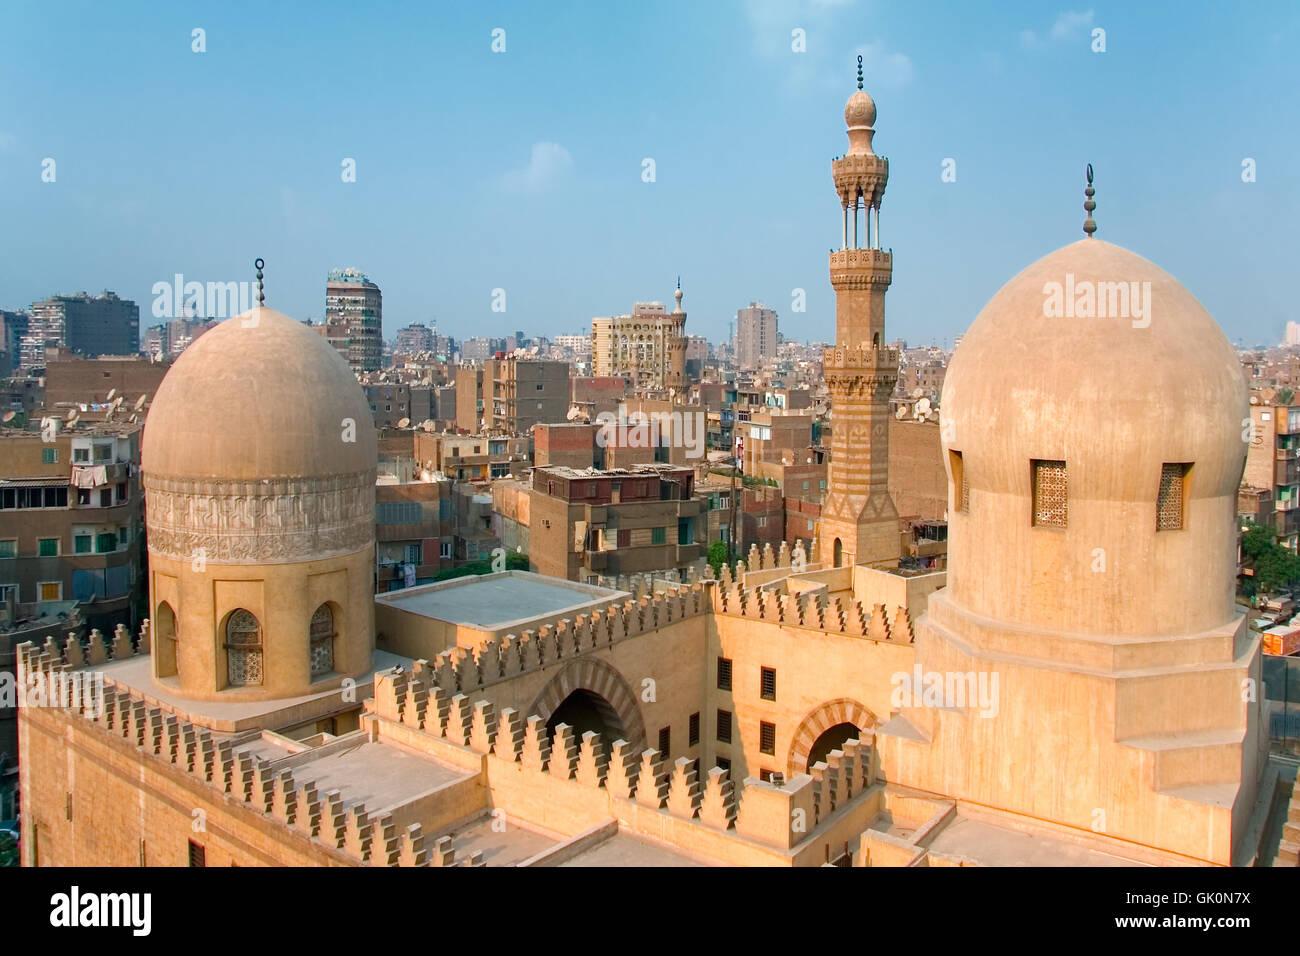 tourism cairo islam - Stock Image